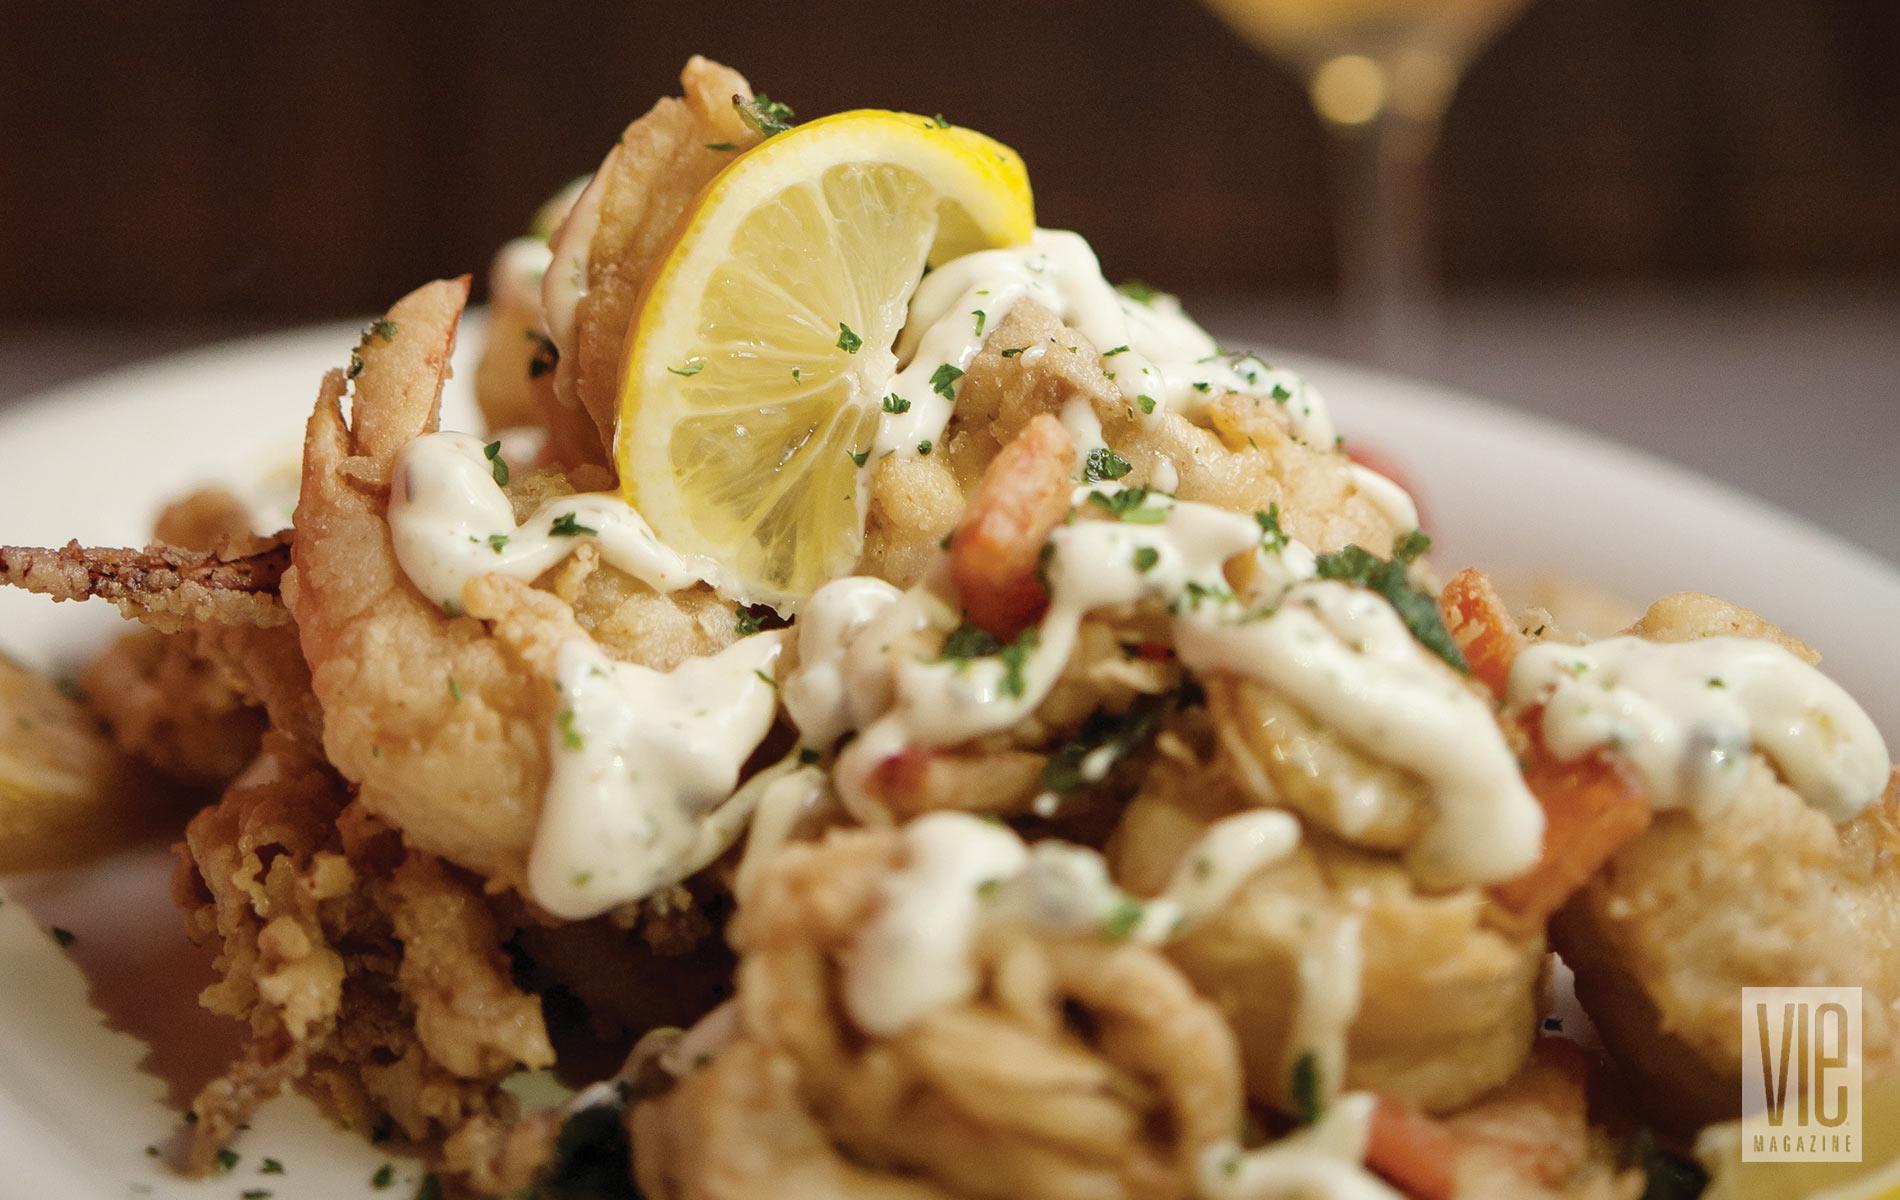 Borago's Savory Fried Shrimp Platter